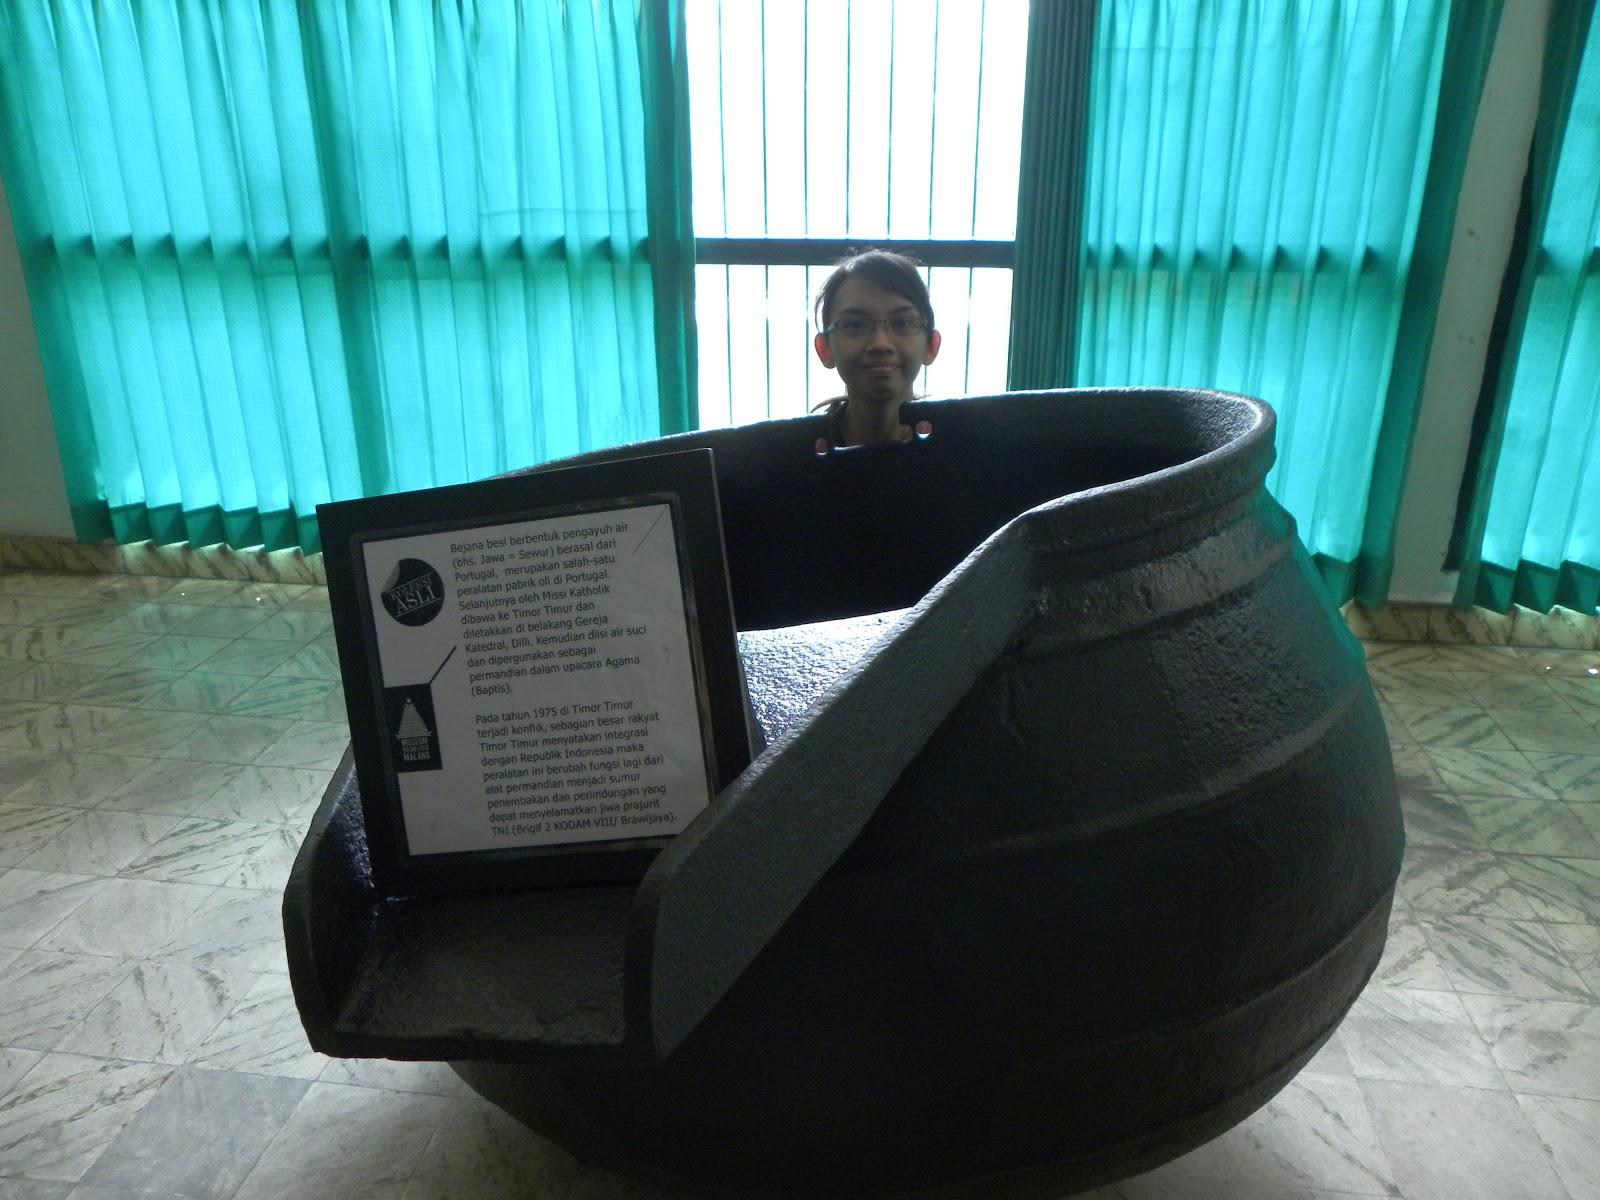 Jendral Soedirman dan pertanyaannya pauji yang bikin aku bingung juga di depan museum ada patung Jendral Soedirman pastinya Soedirman uda berperan